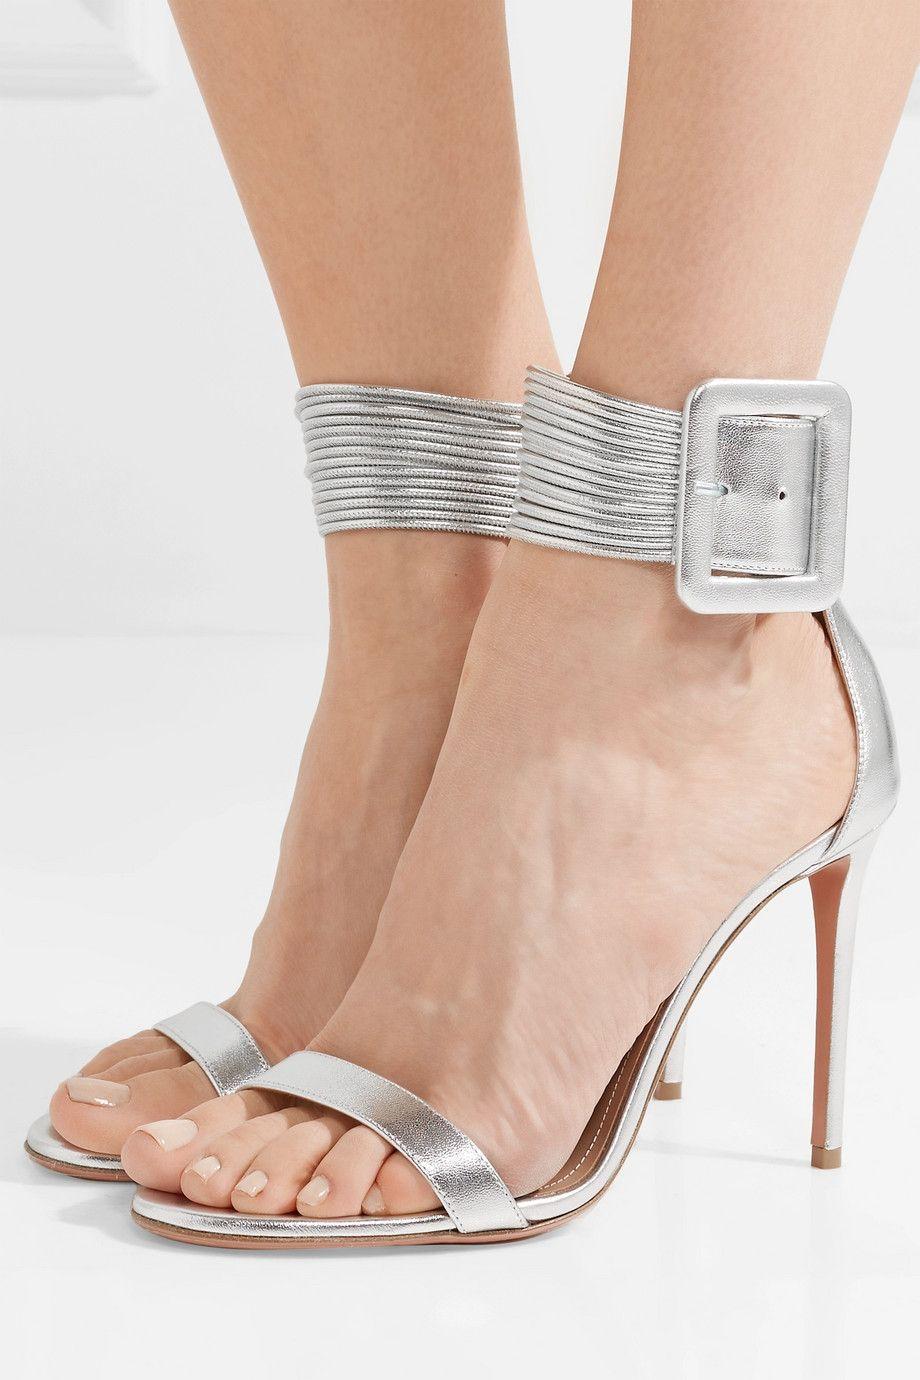 Casablanca Metallic Leather Sandals Aquazzura 4rKkN